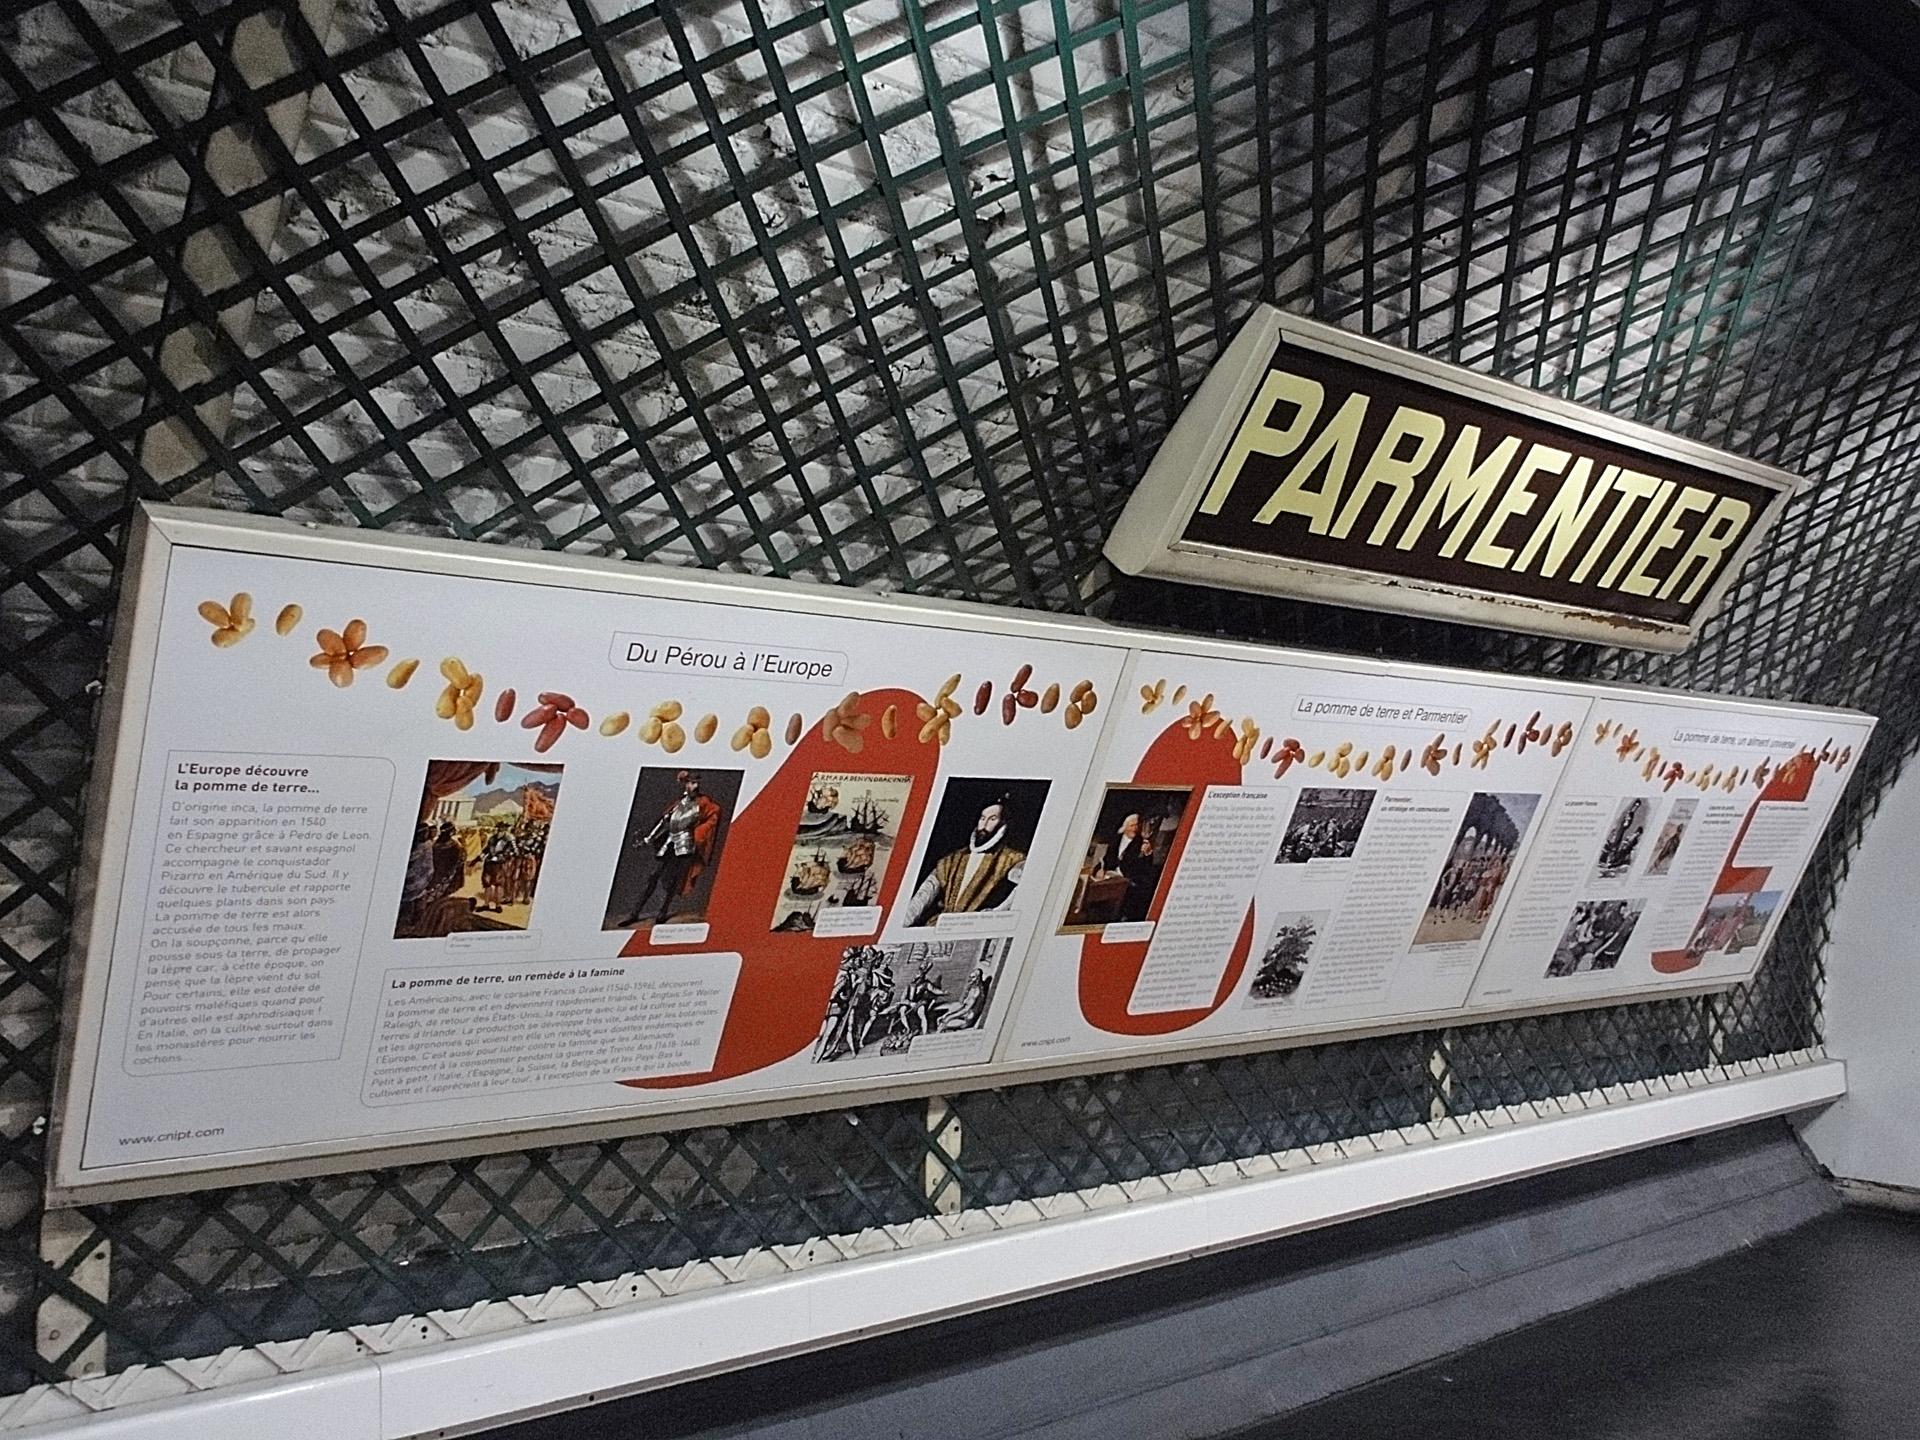 Metro de Paris - Ligne 3 - Parmentier 06.jpg